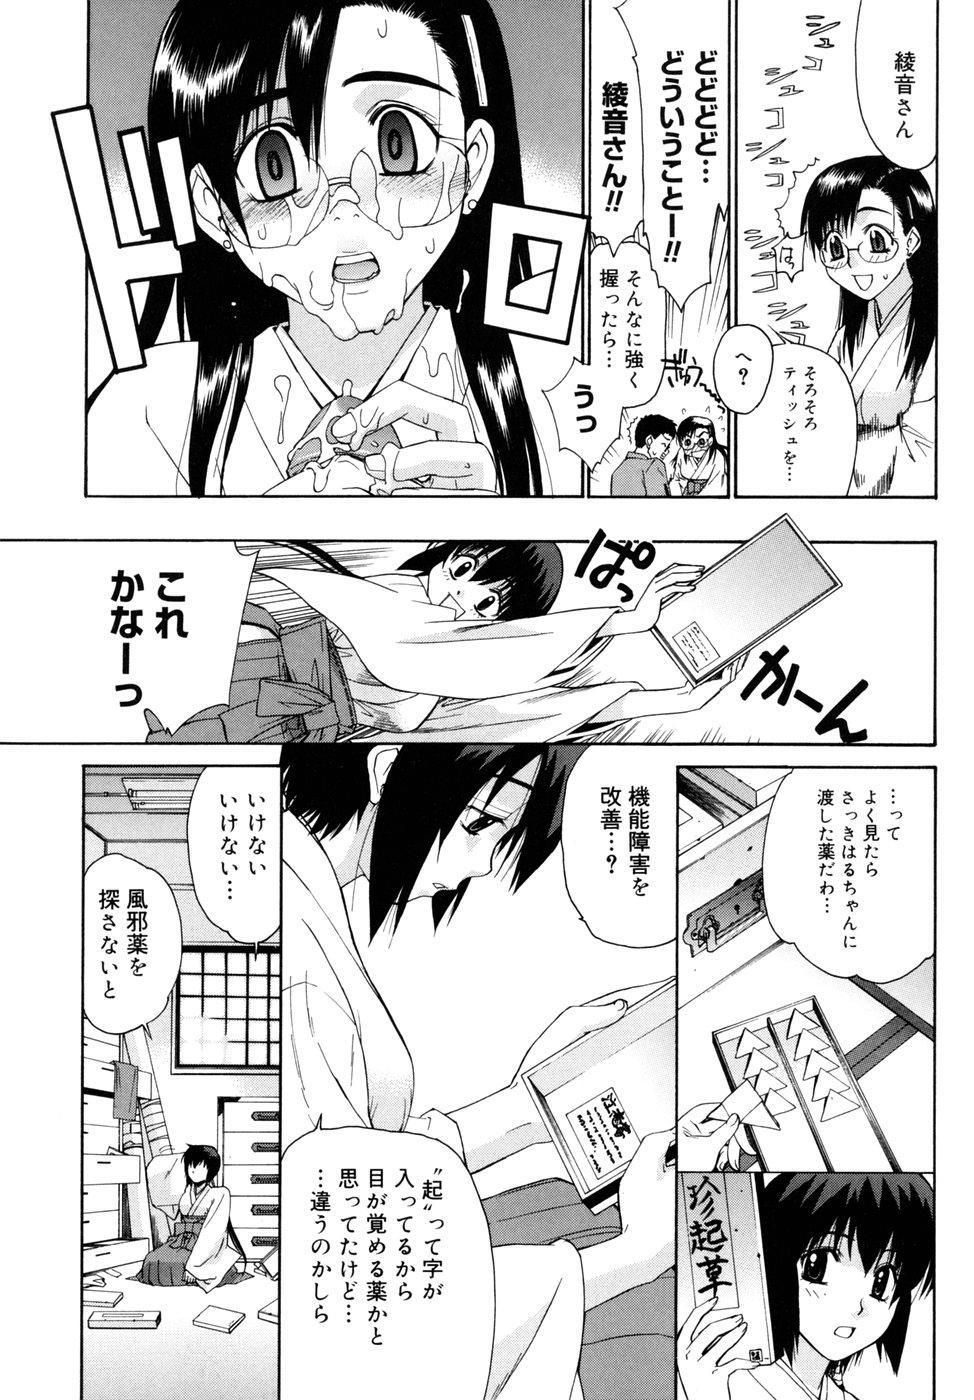 [Yaya Hinata] Tonari no Miko-san wa Minna Warau - The next shrine maidens smile in everyone. 102